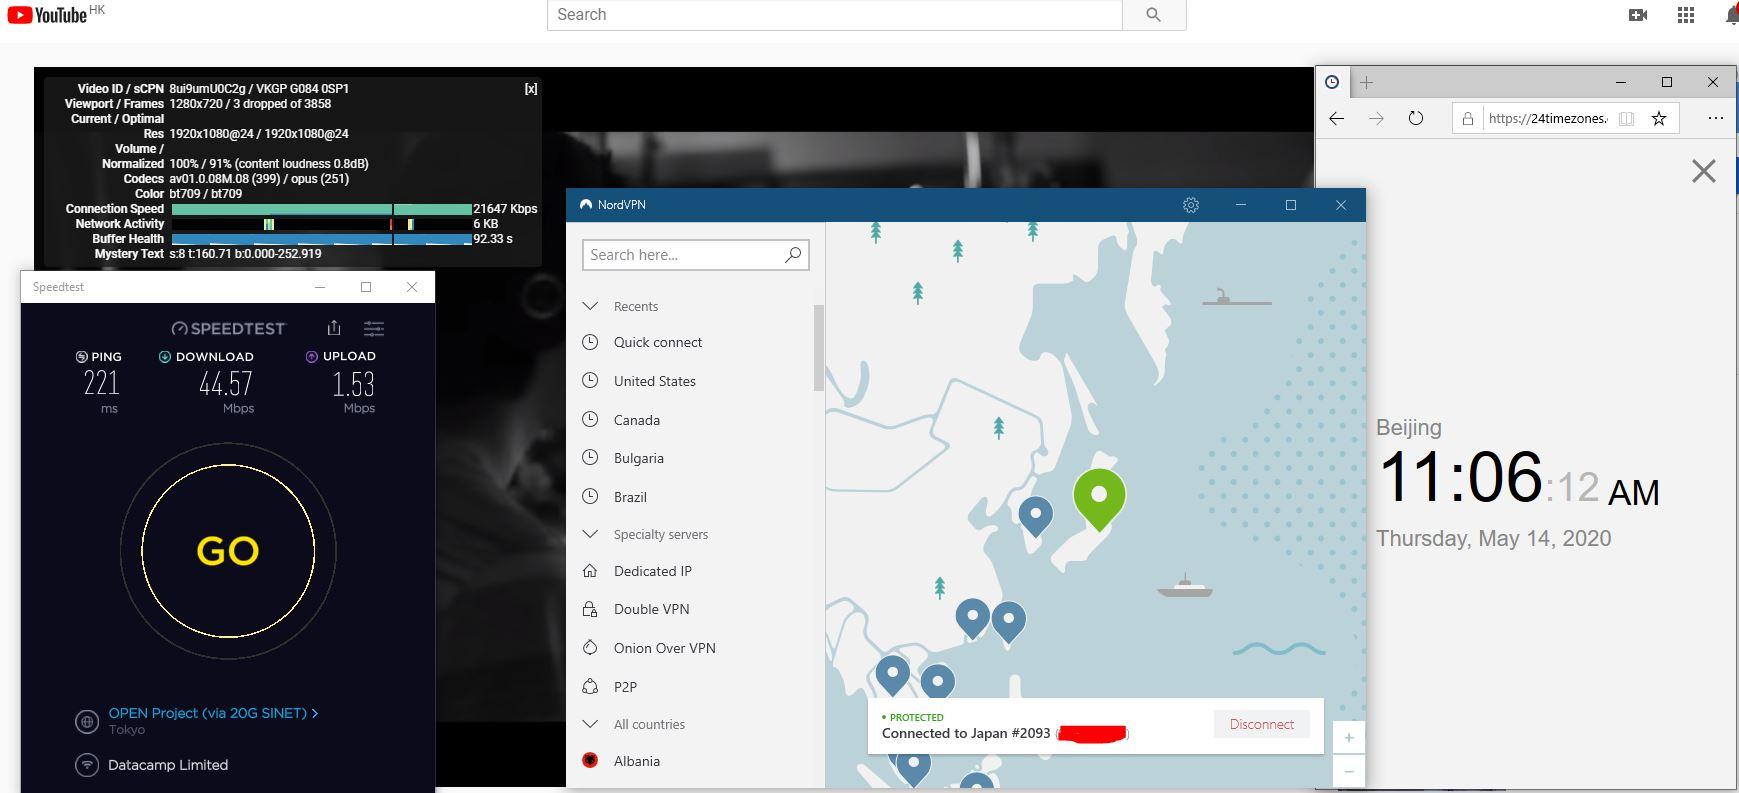 Windows10 NordVPN Japan #2093 中国VPN 翻墙 科学上网 Speedtest+youtube测速-20200514